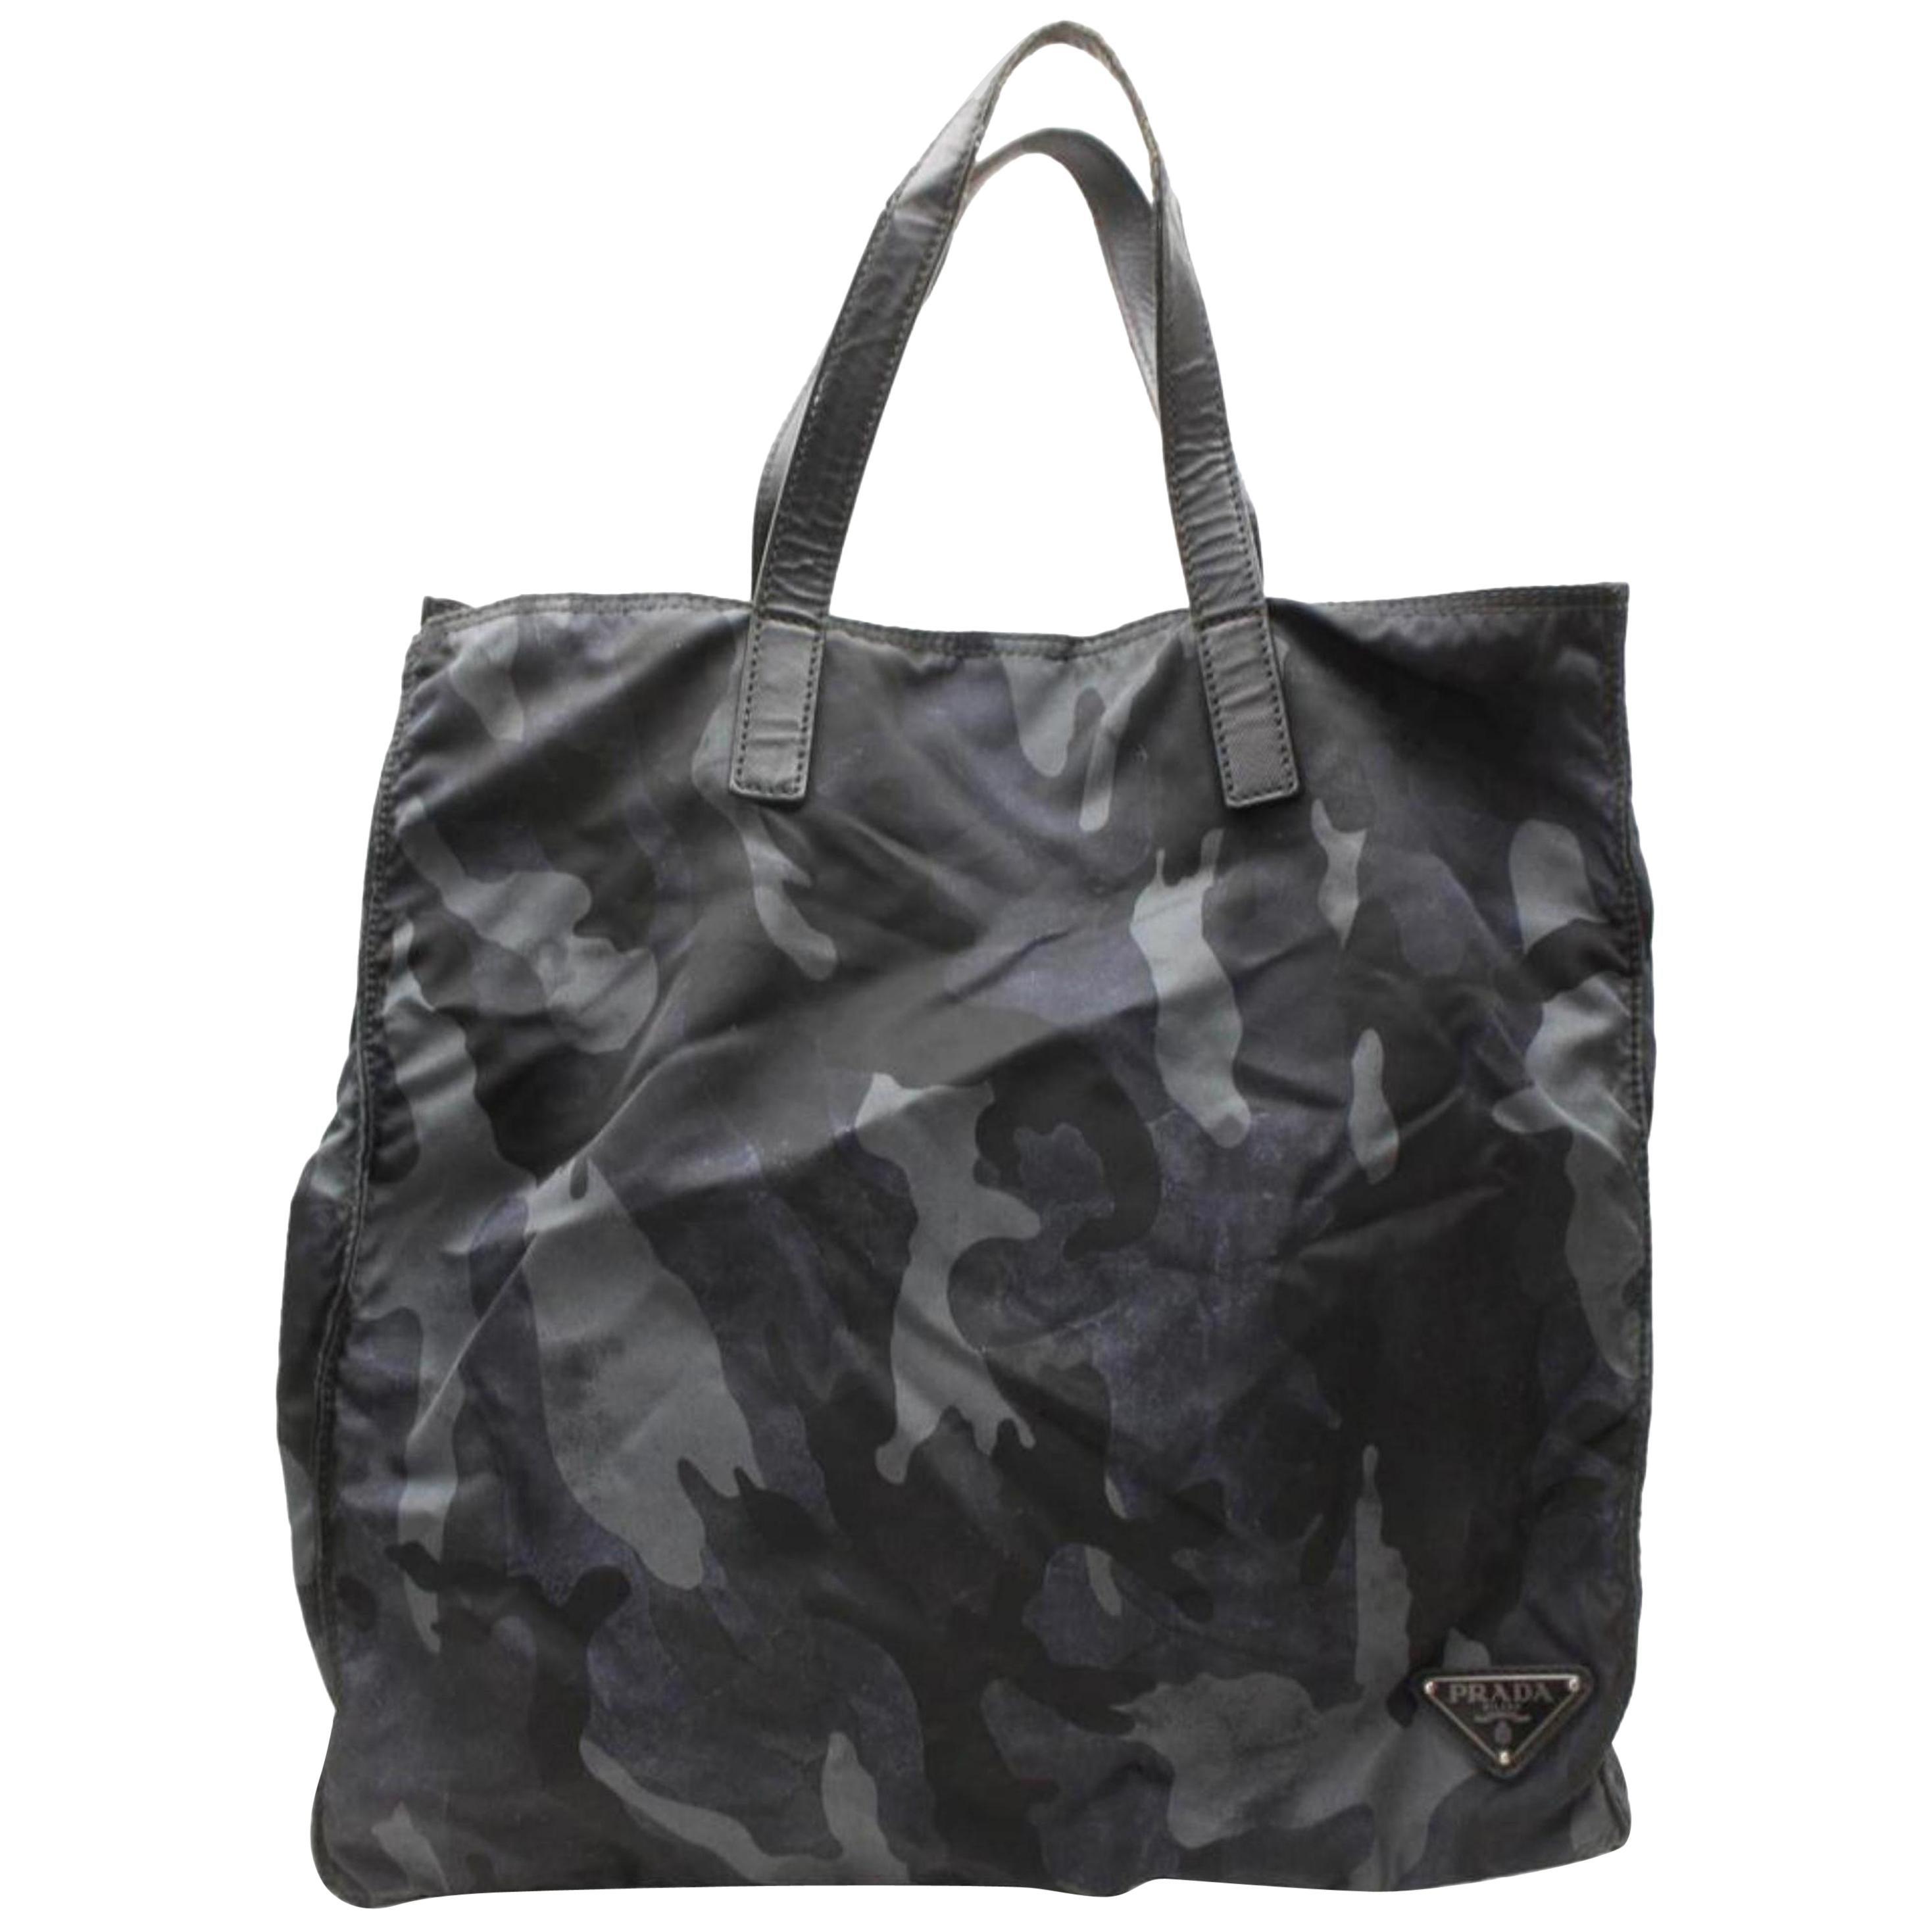 84af4ef062b8 Prada Black Nylon Tote Bag at 1stdibs